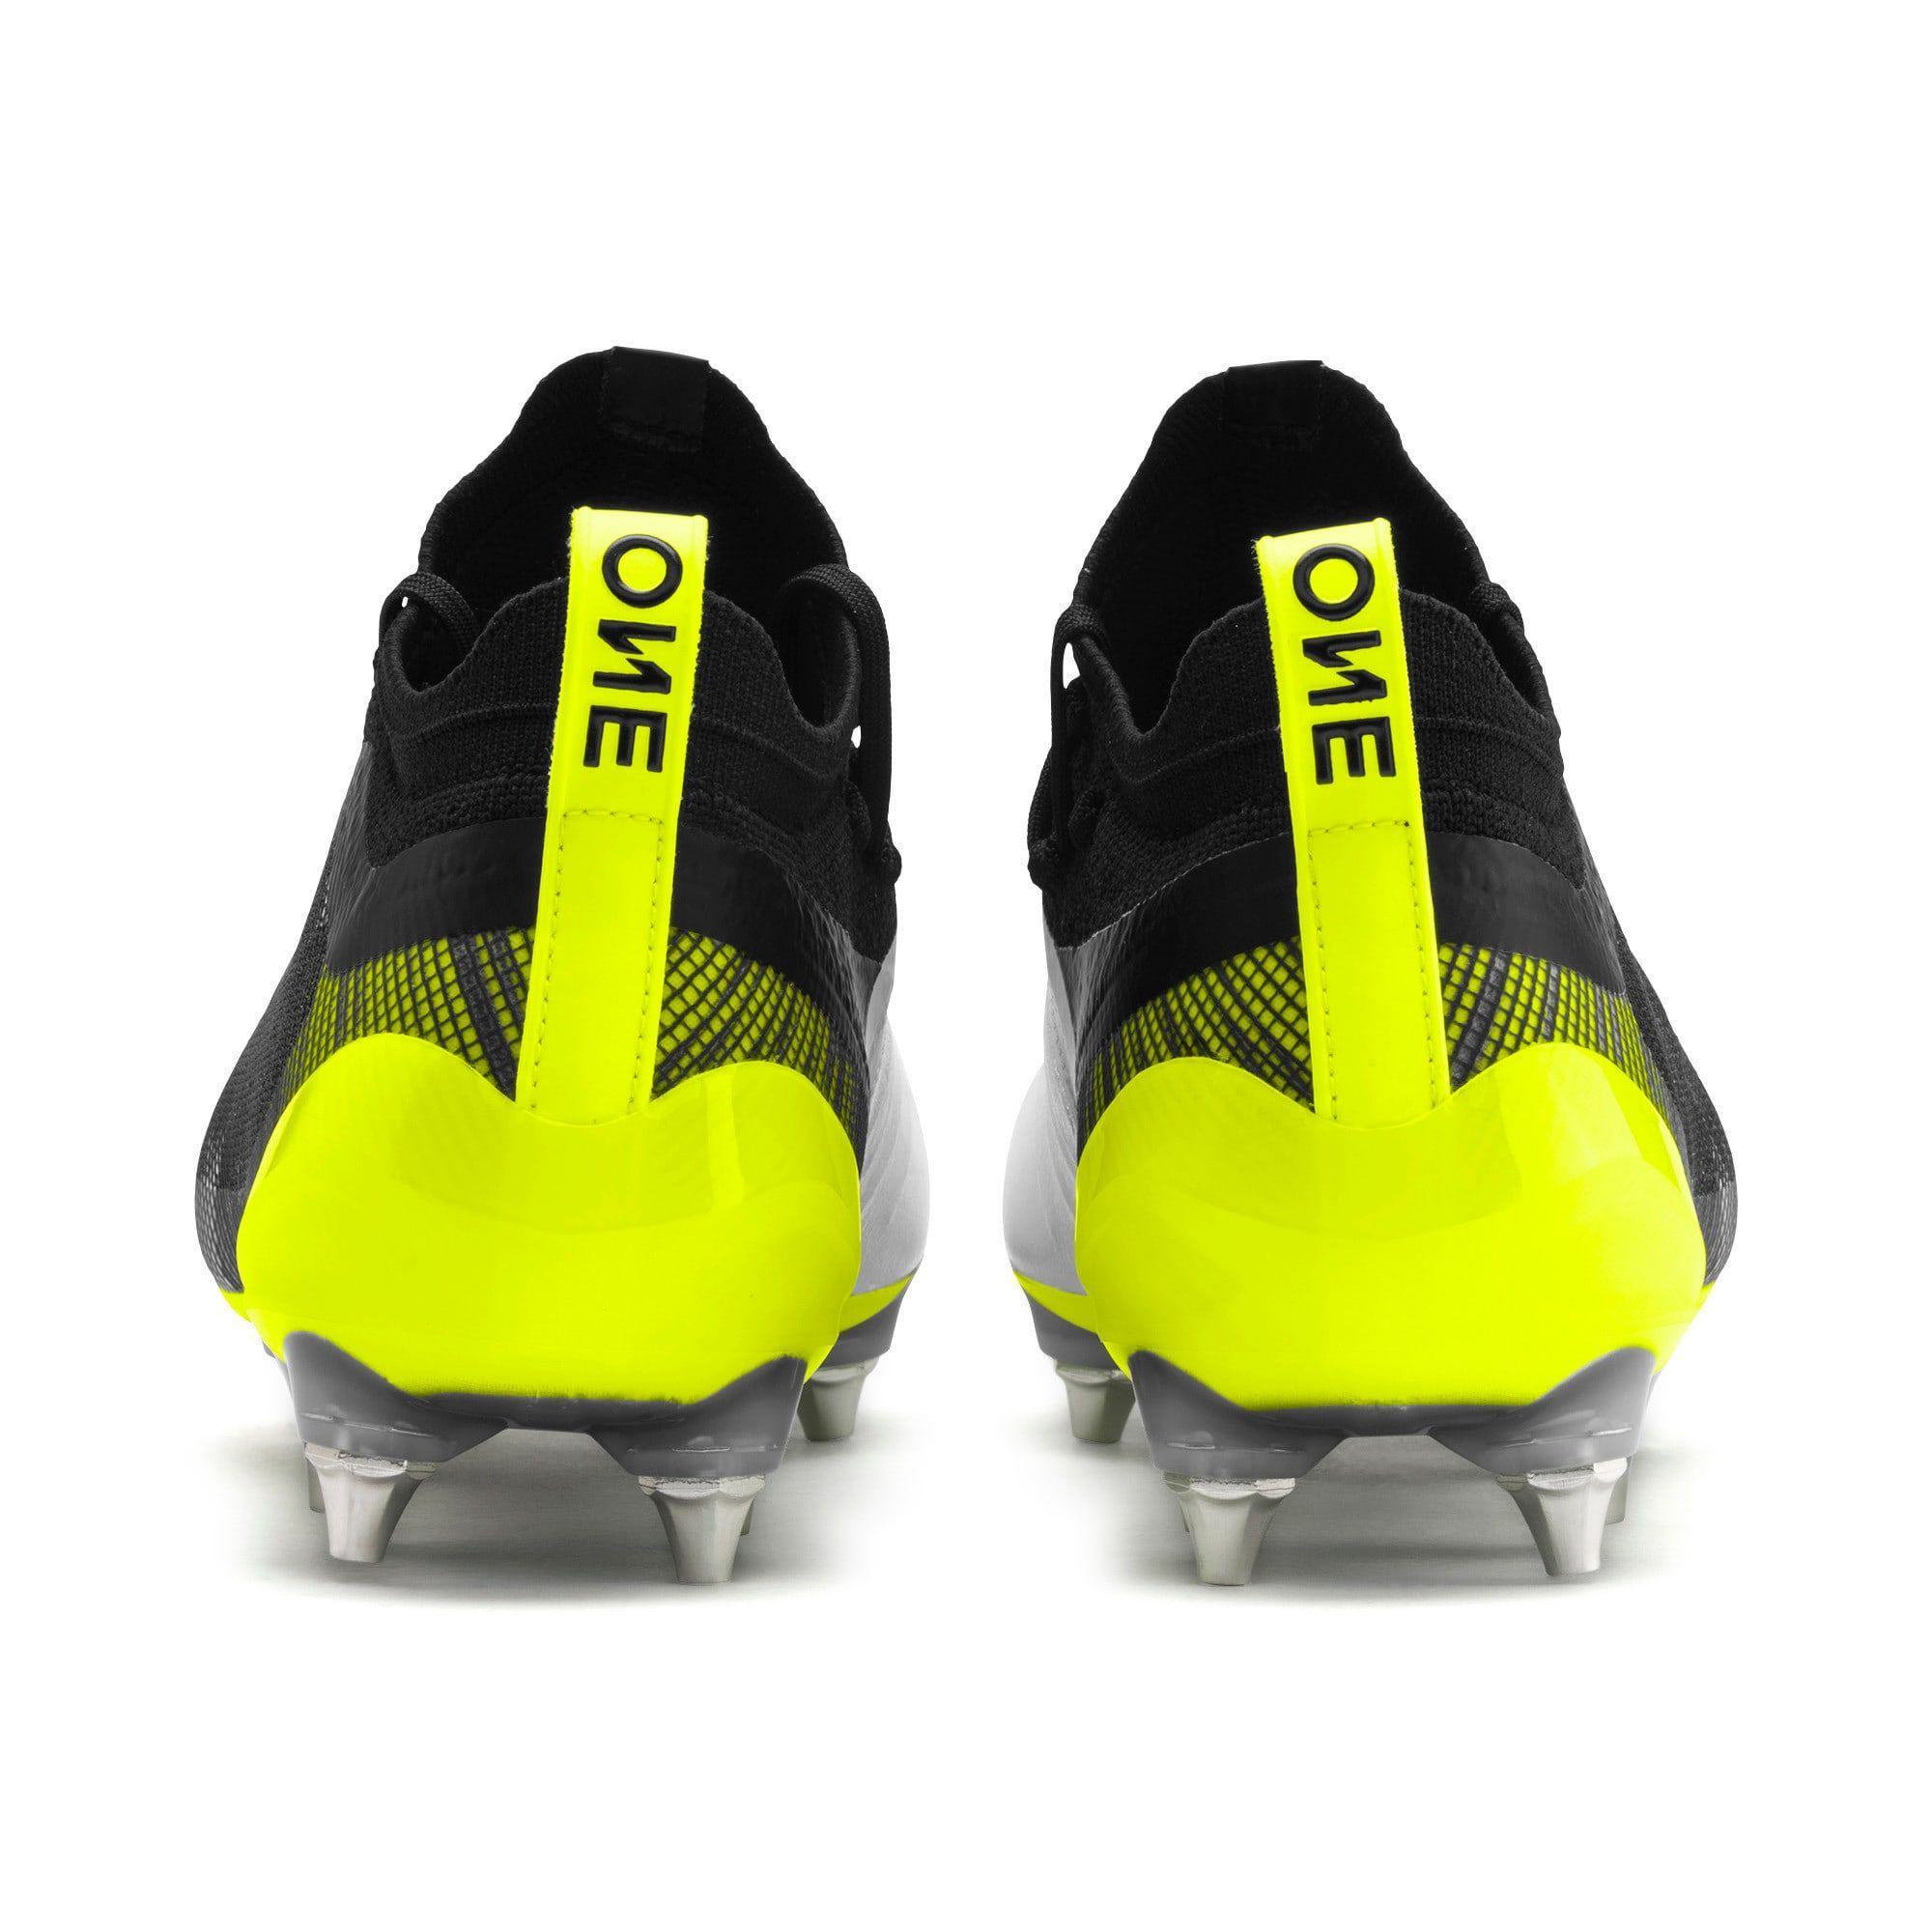 PUMA One 51 Mxsg Football Boots in WhiteBlackYellow Alert size 105 PUMA One 51 Mxsg Football Boots in WhiteBlackYellow Alert size 105 PUMA One 51 Mxsg Football Boots in W...